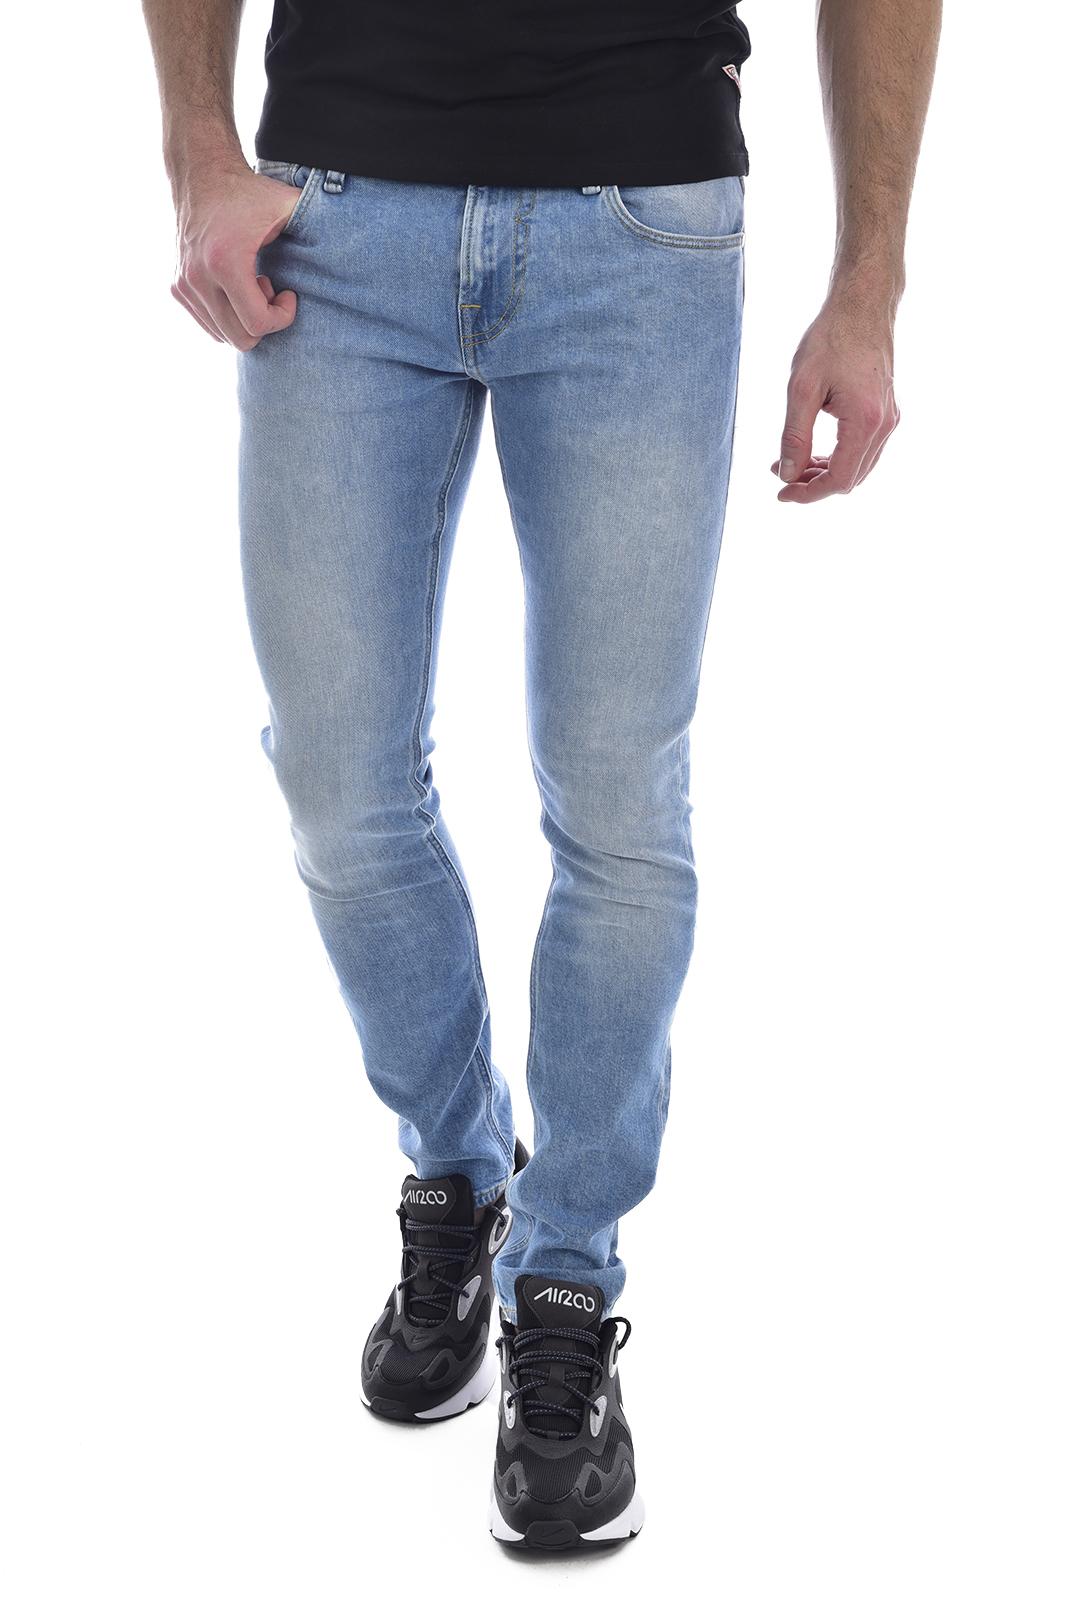 slim / skinny  Guess jeans M02A27 D3Y93 CHRIS AMBu AMBUSH